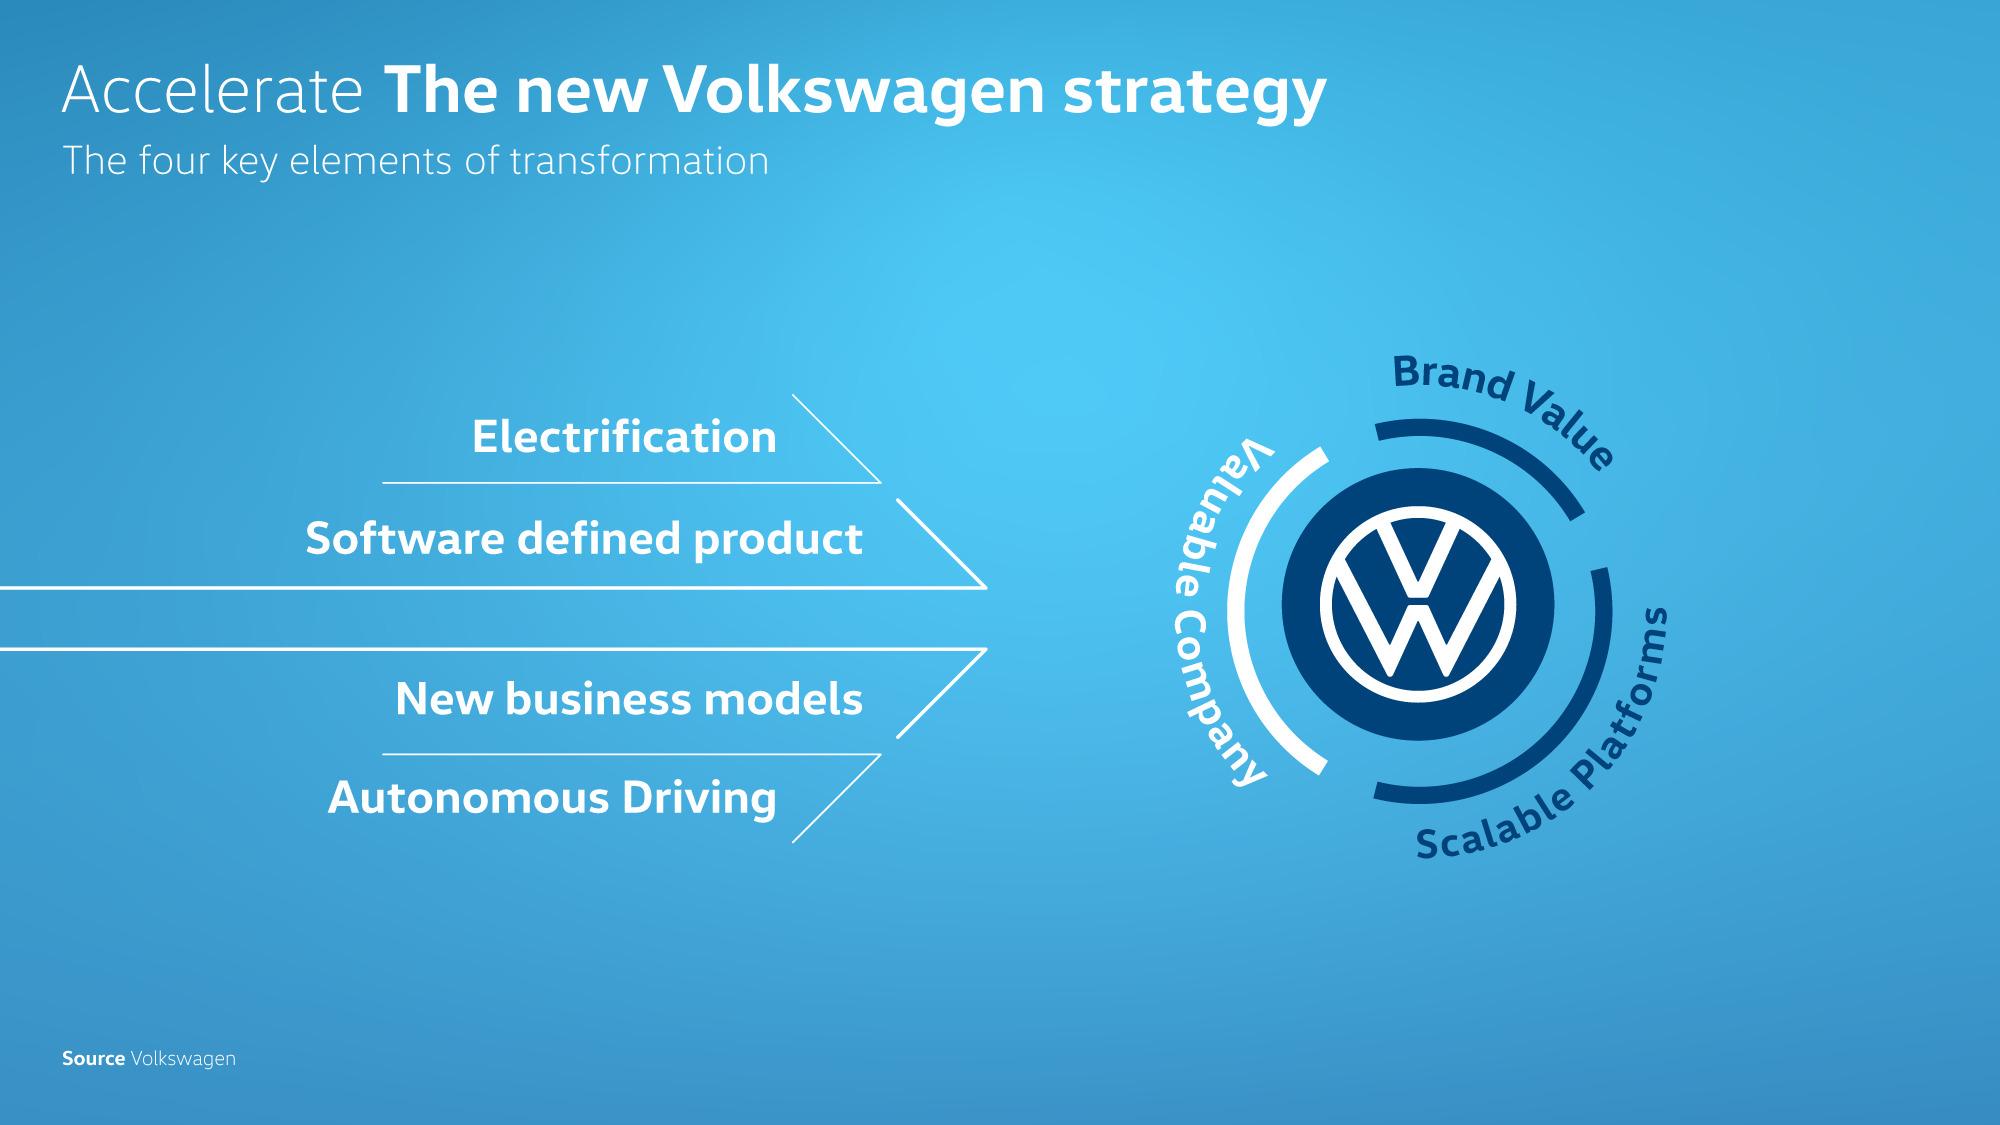 VW_Accelerate_strategy_アクセレレート戦略